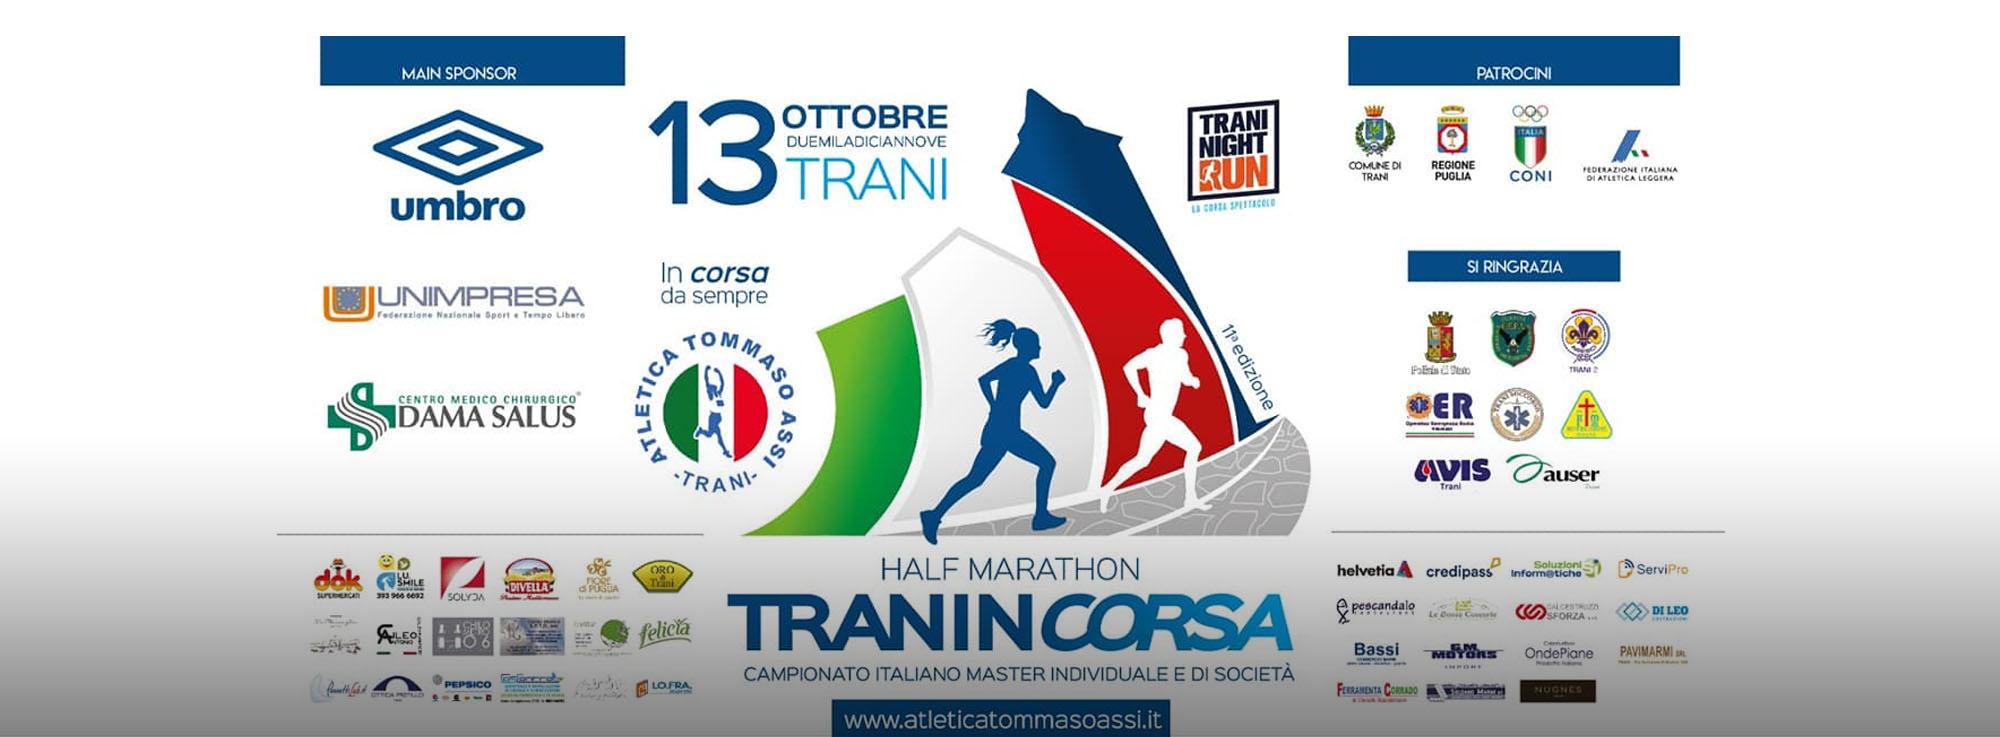 Trani: Tranincorsa 'Tommaso Assi Half Marathon'